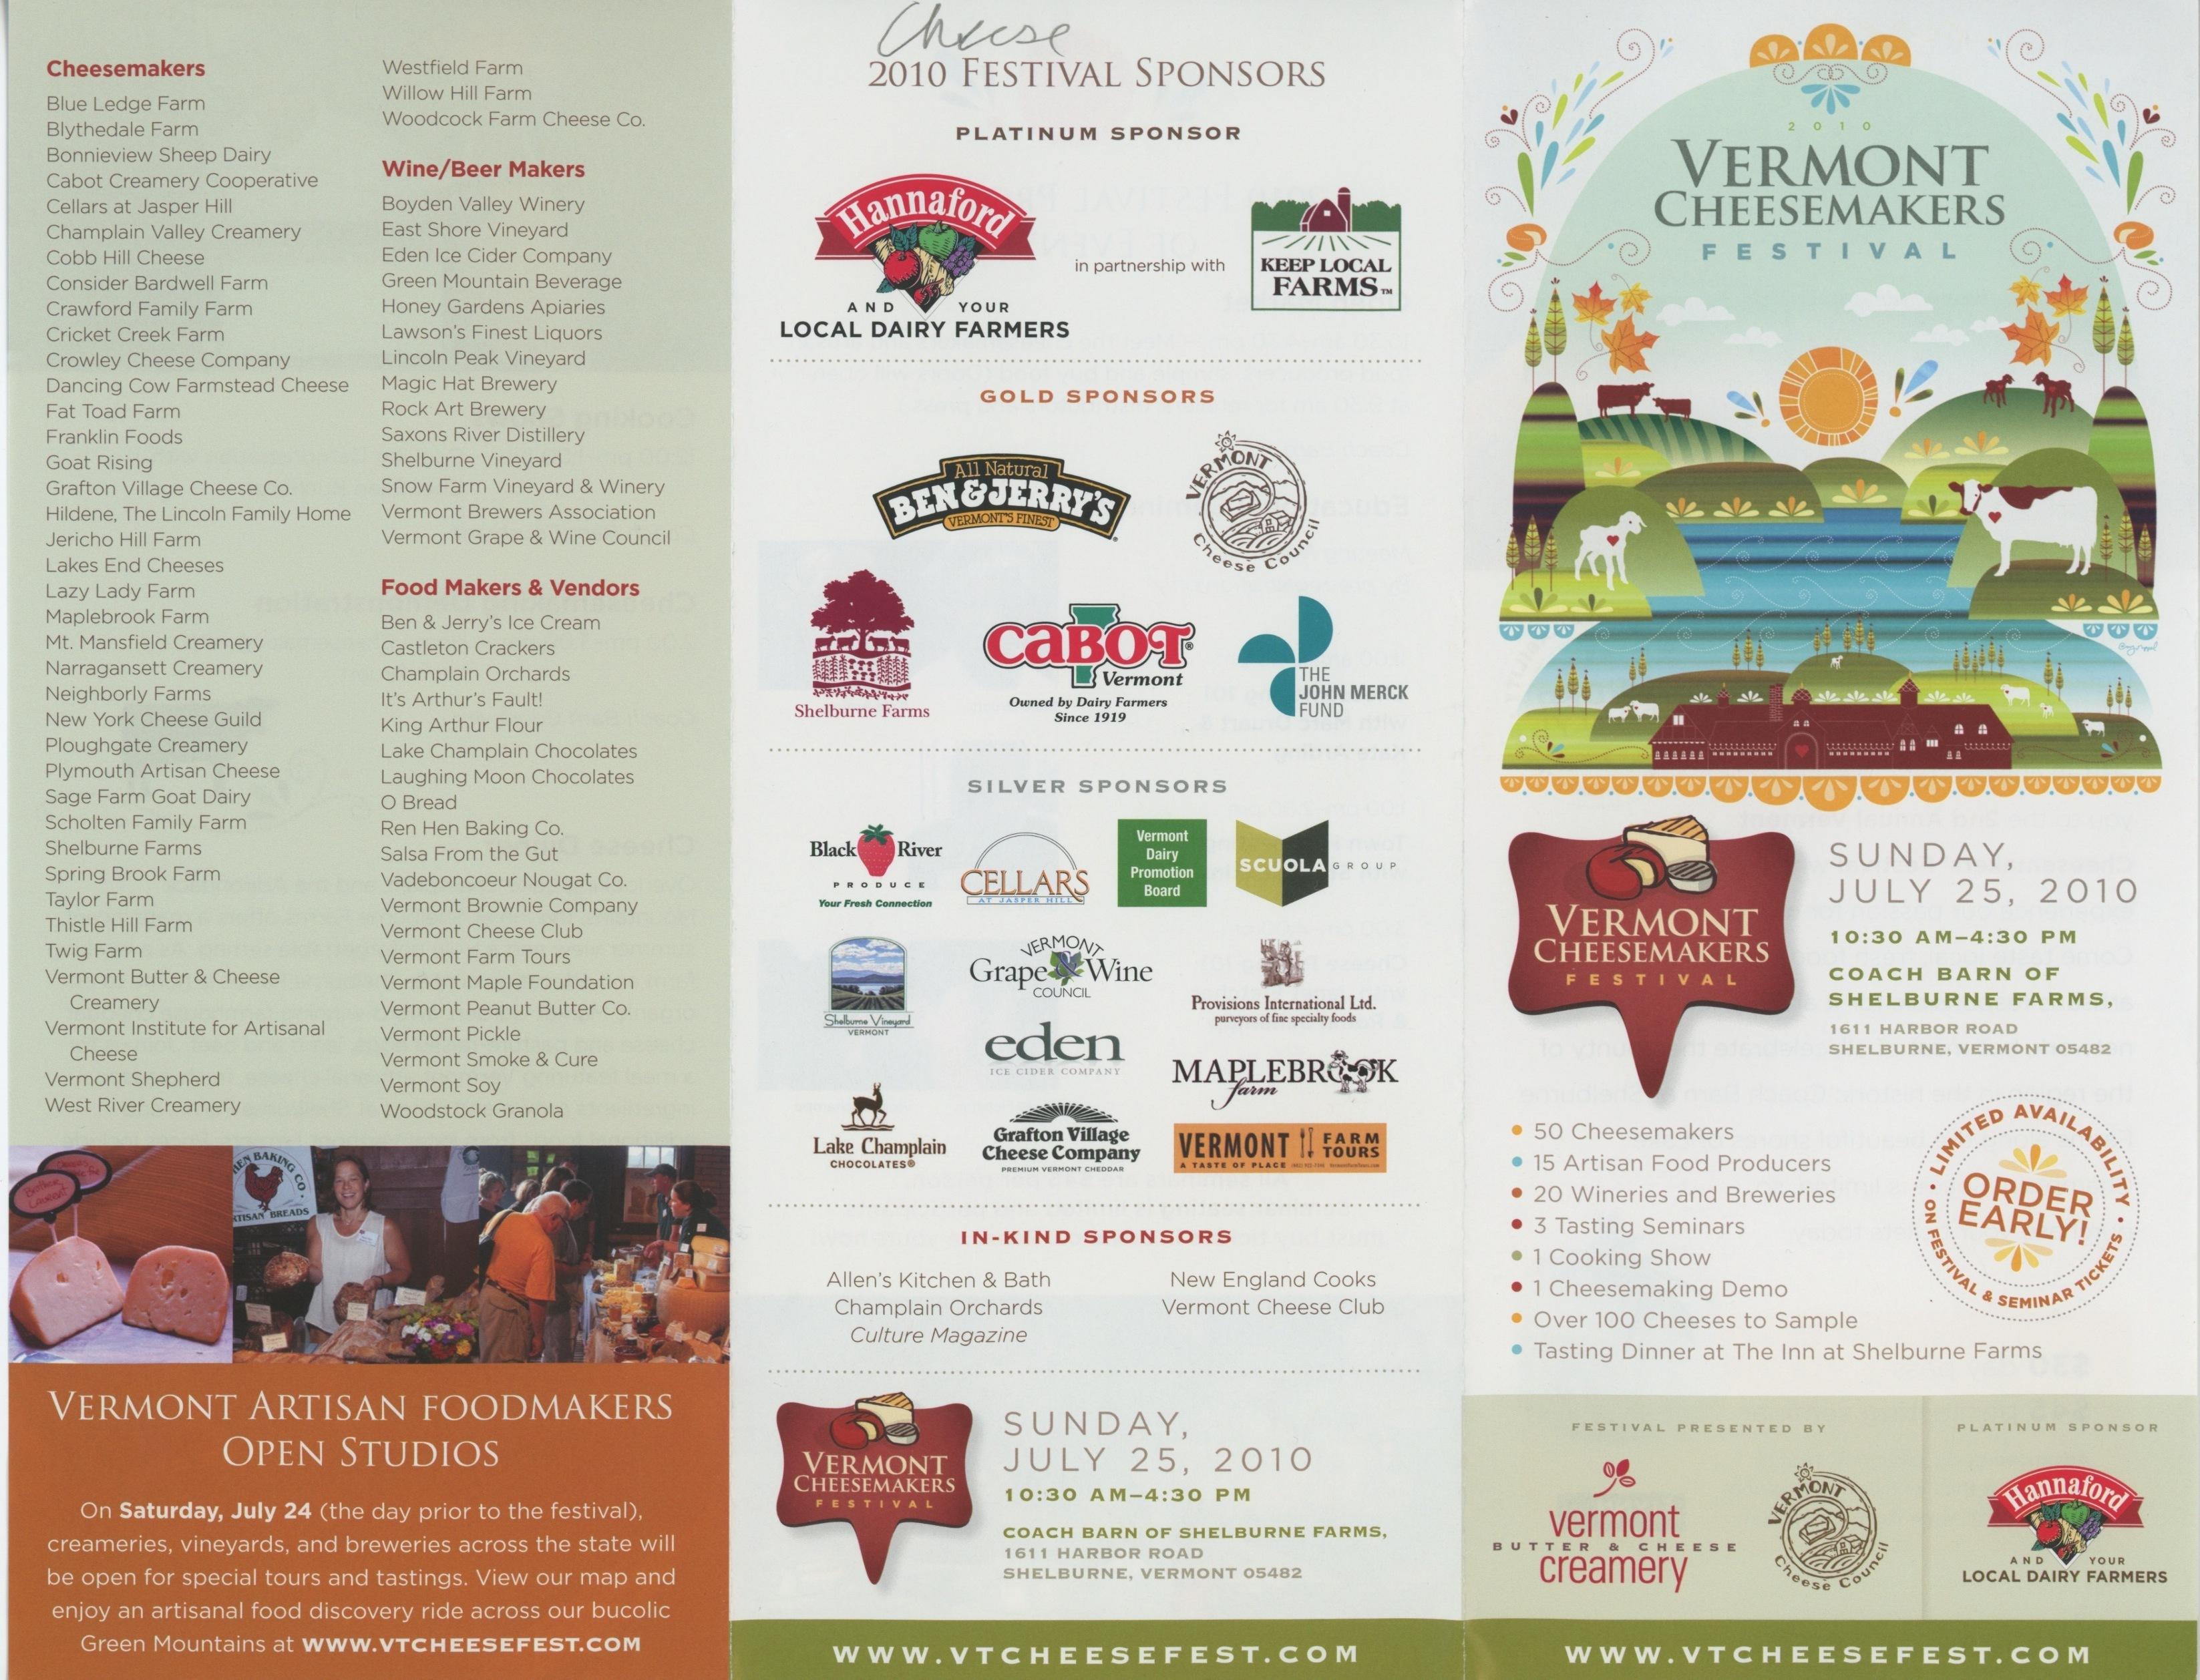 2010 Festival Program of Events